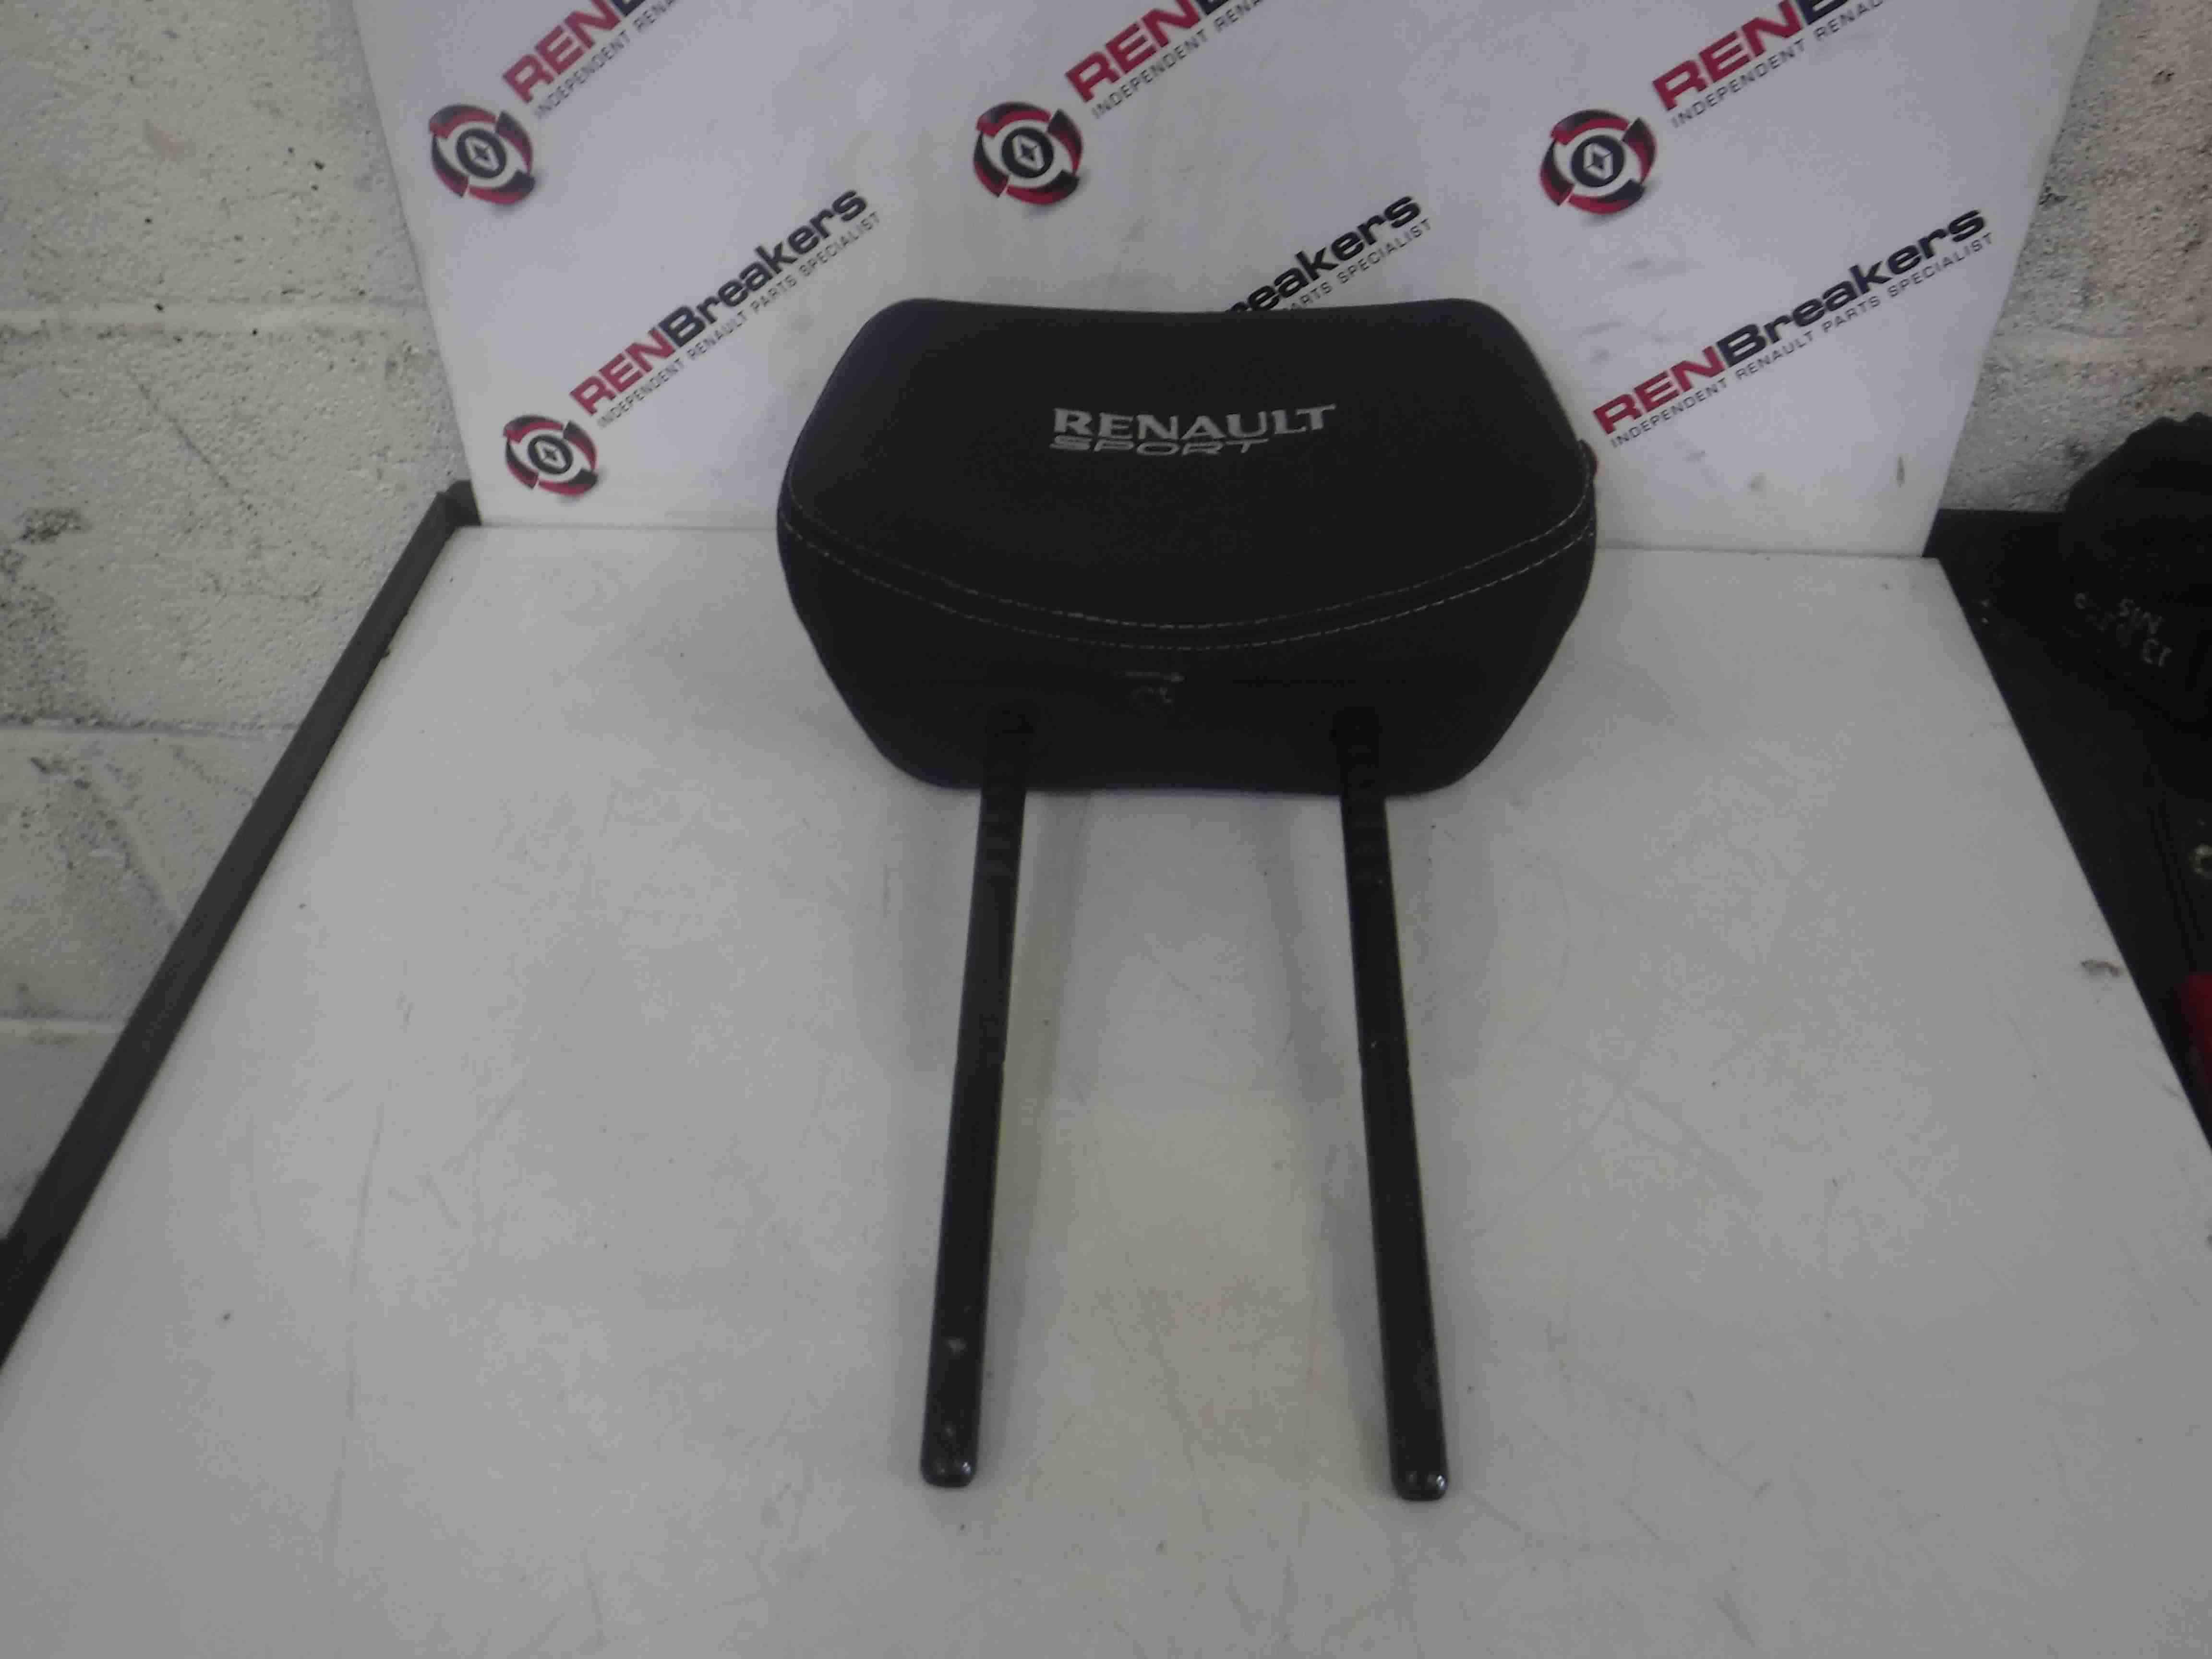 Renault Clio Sport 2005-2012 197 200 Passenger Drivers NS OS Headrest